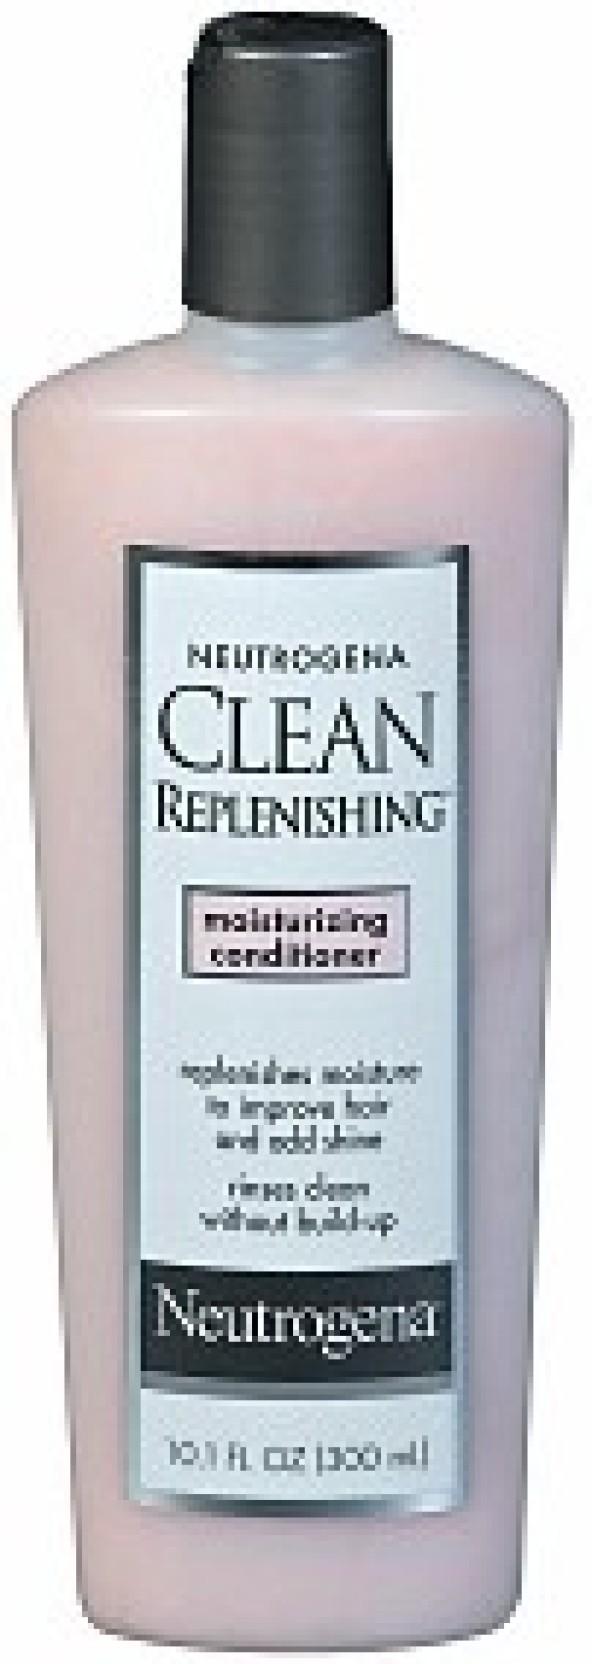 Neutrogena Clean Replenishing Conditioner Home